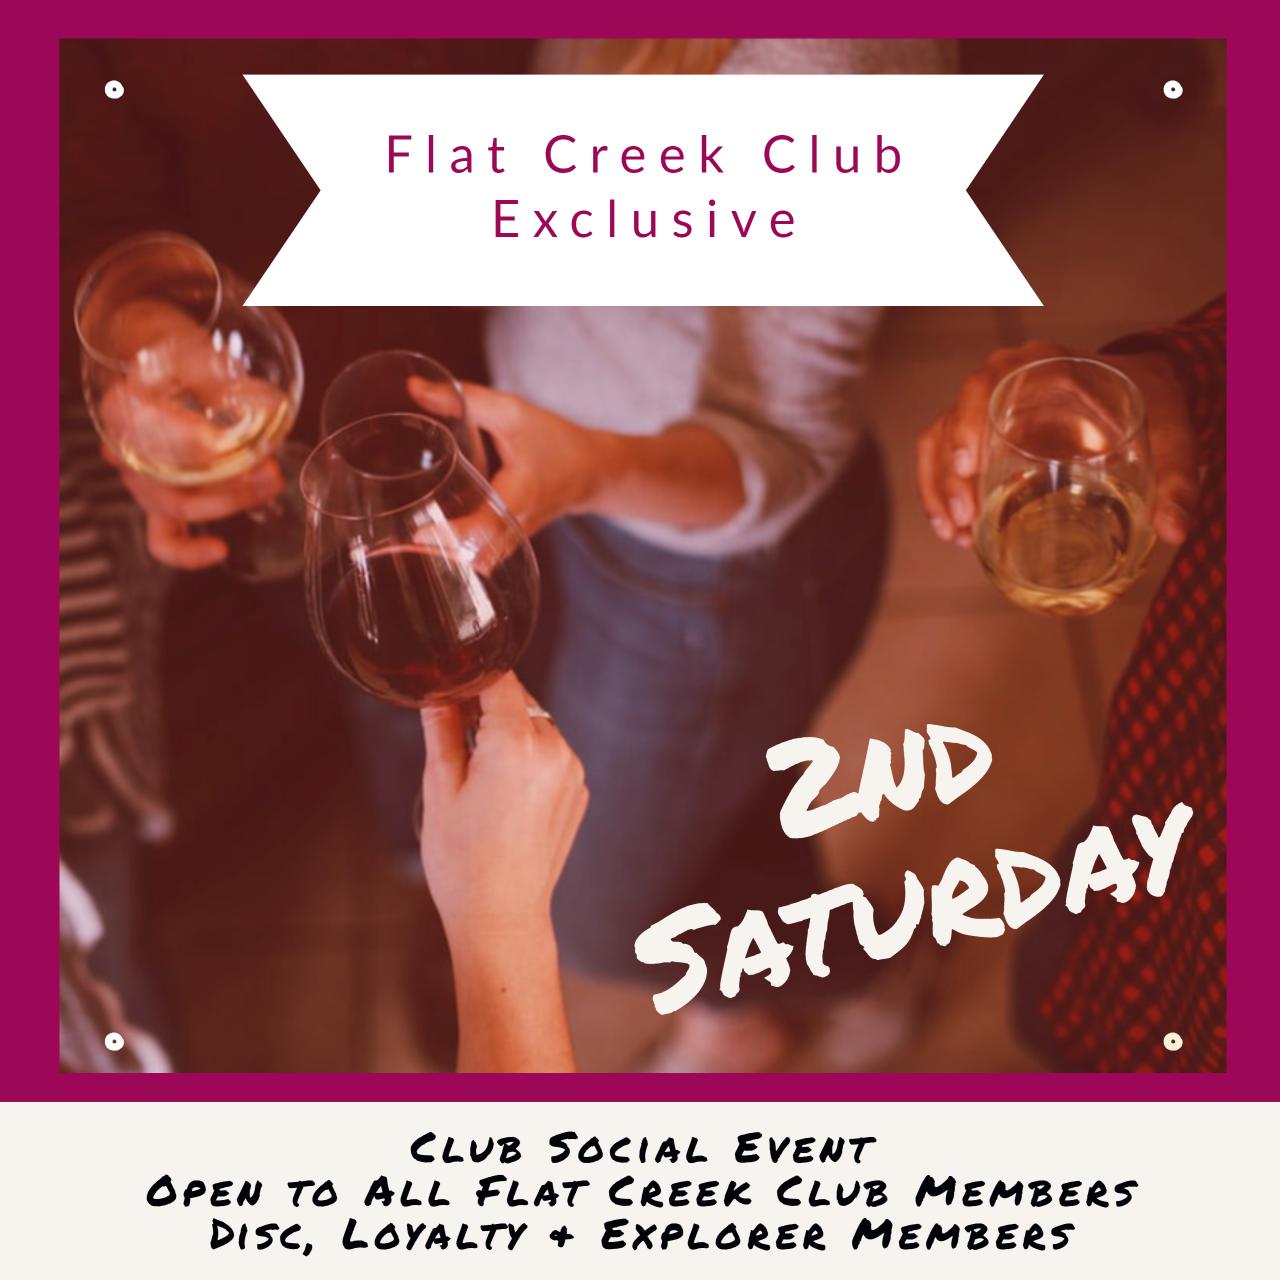 CLUB EXCLUSIVE - 2nd Saturday Social